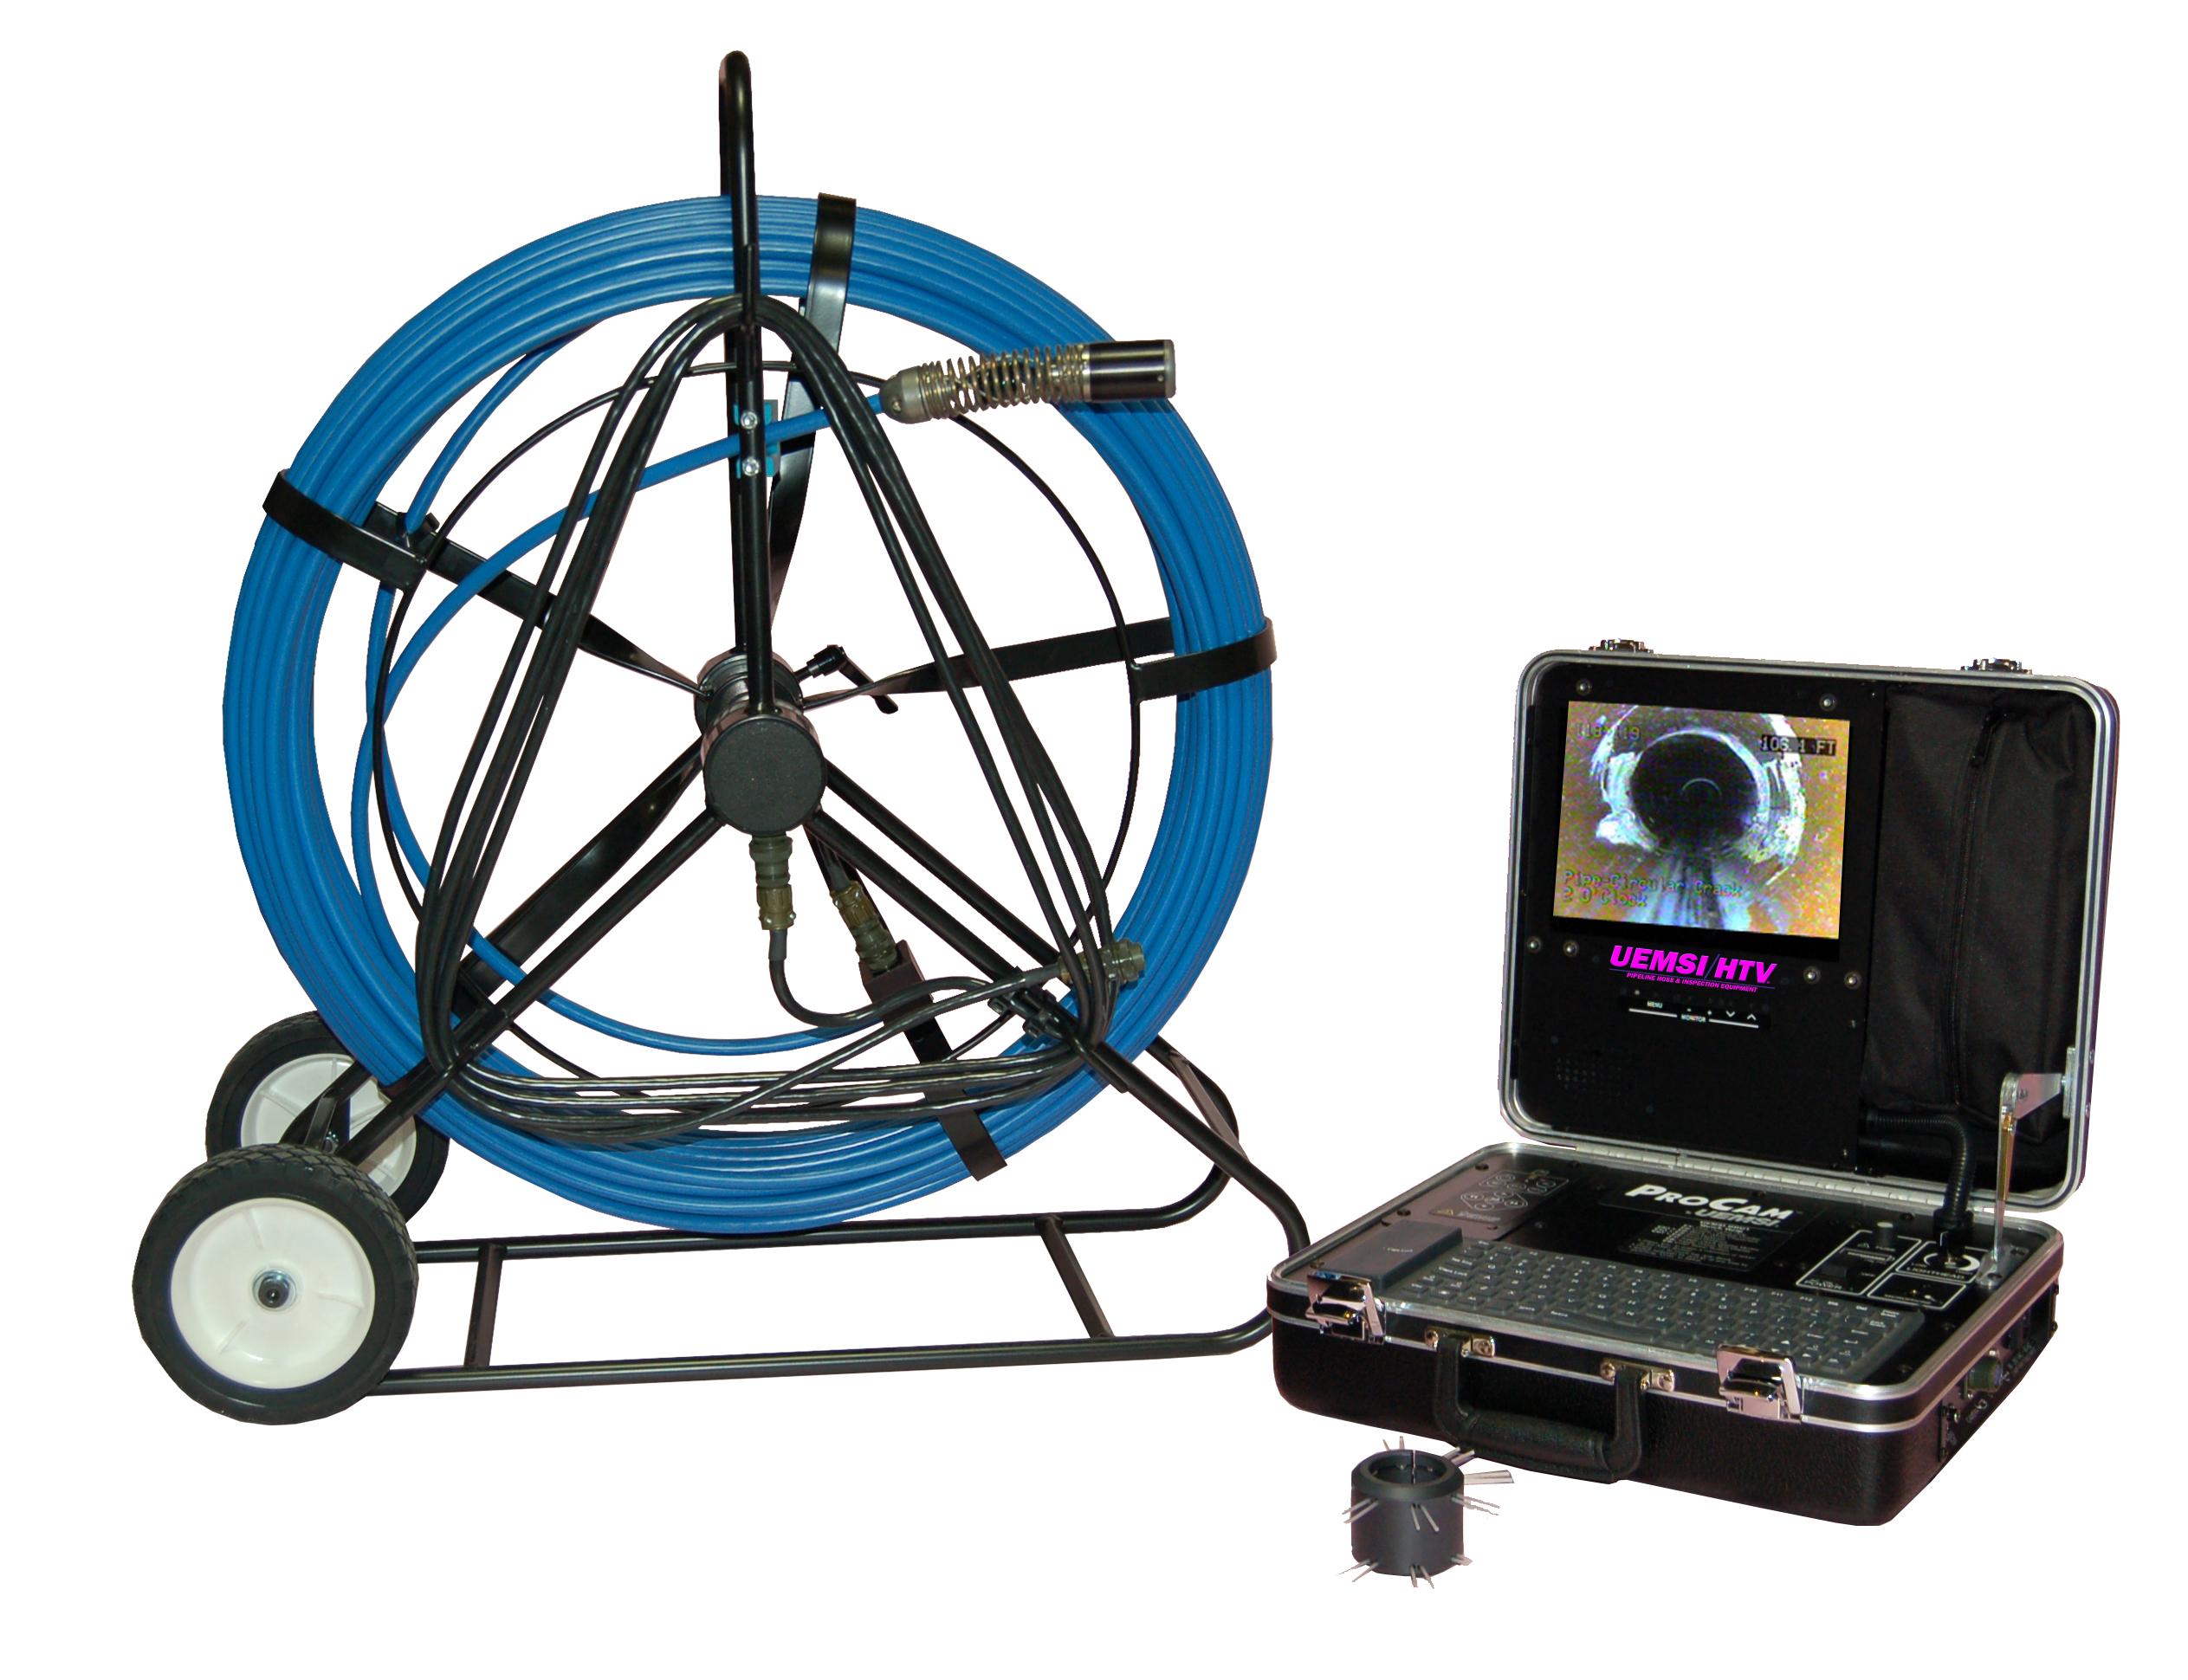 Procam 174 Dvr Color Mini Camera Inspection System With Dvr